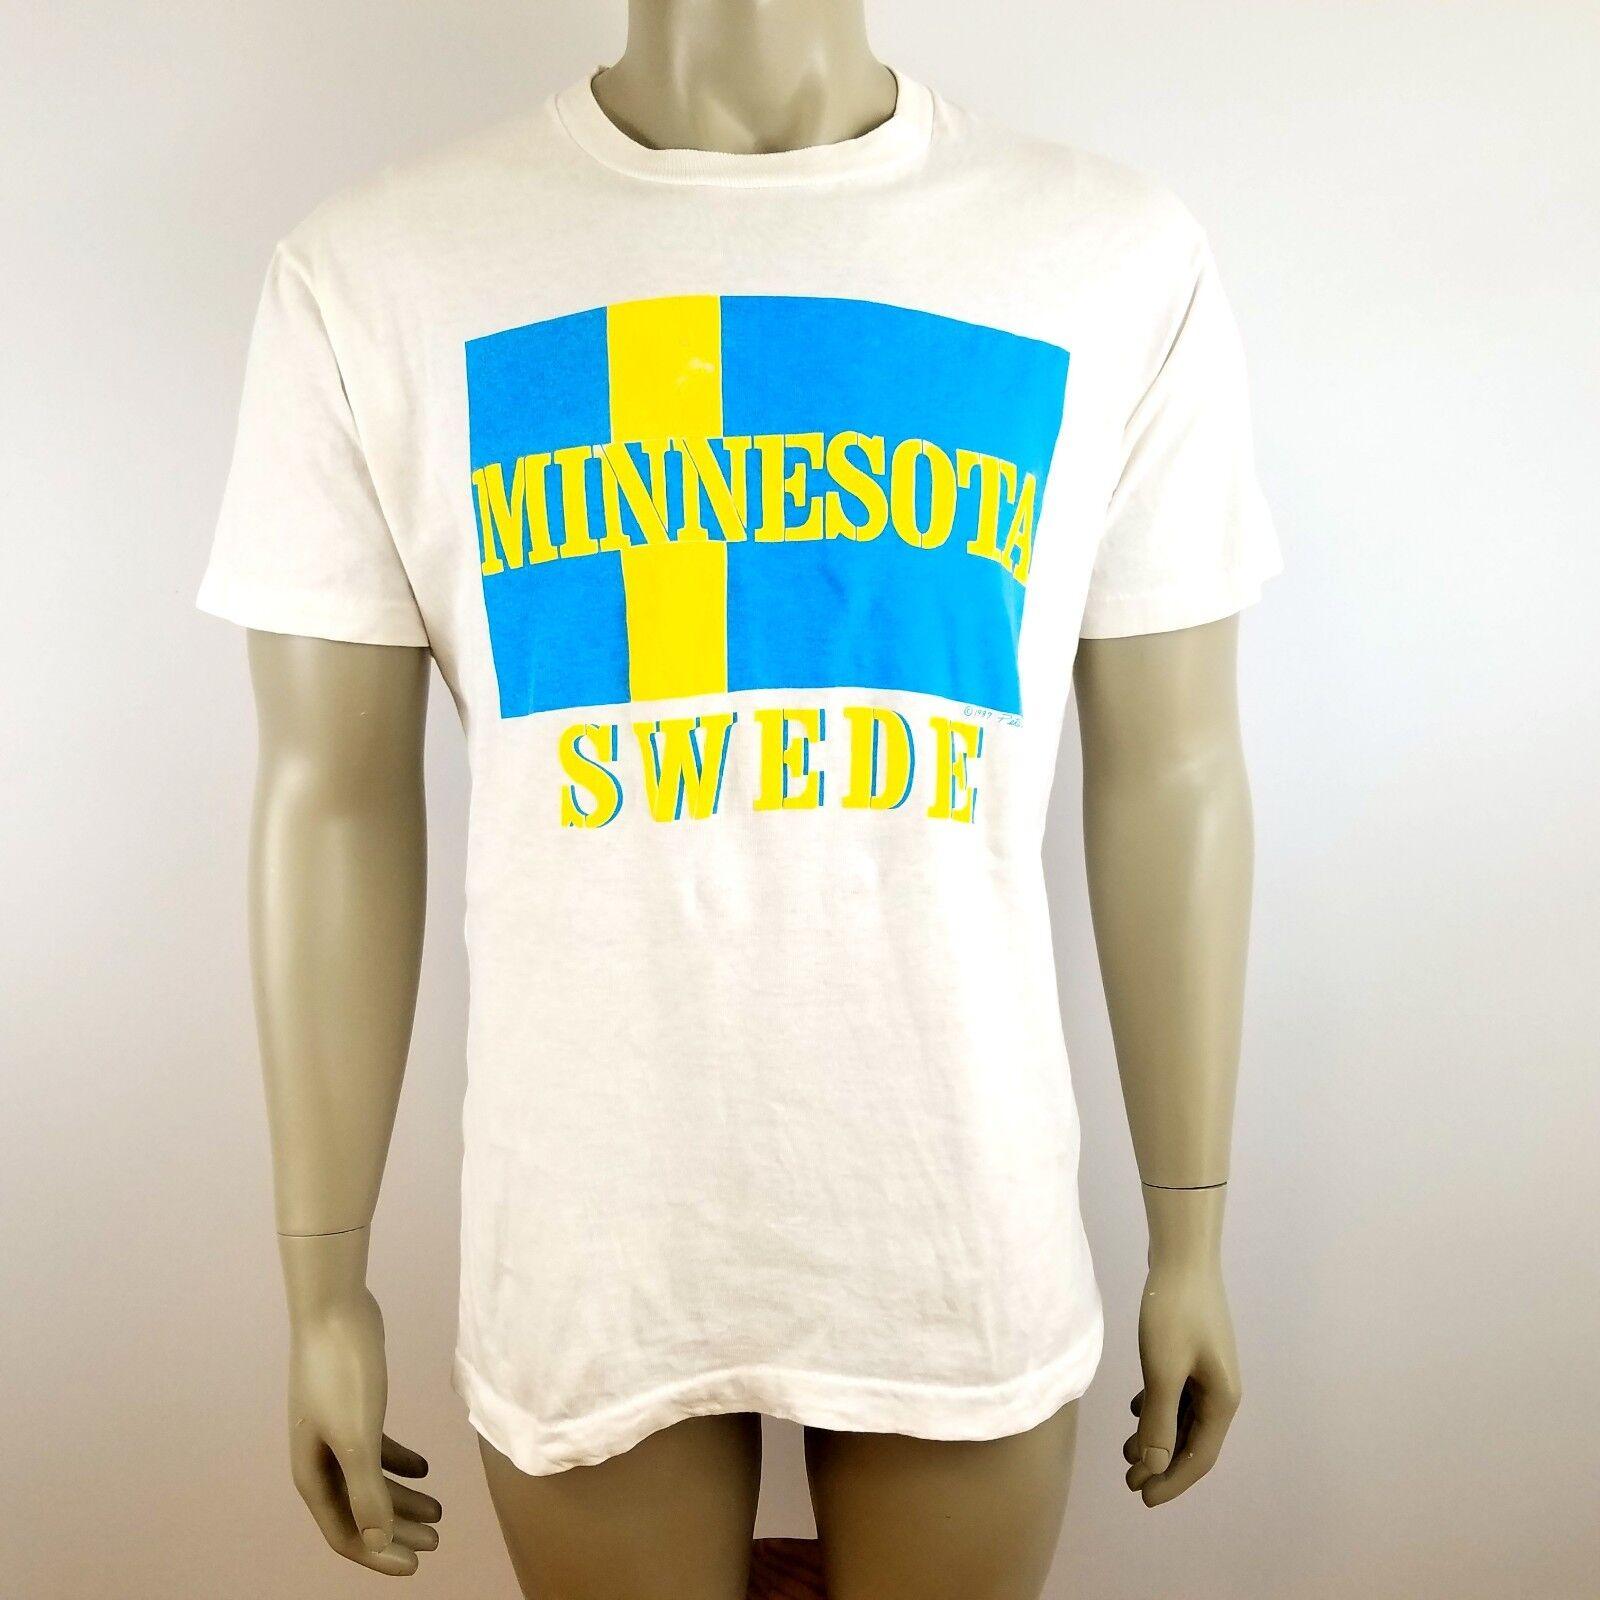 VTG 80's Minnesota Swede Unisex Size Large Single Stitch T-Shirt Distressed USA